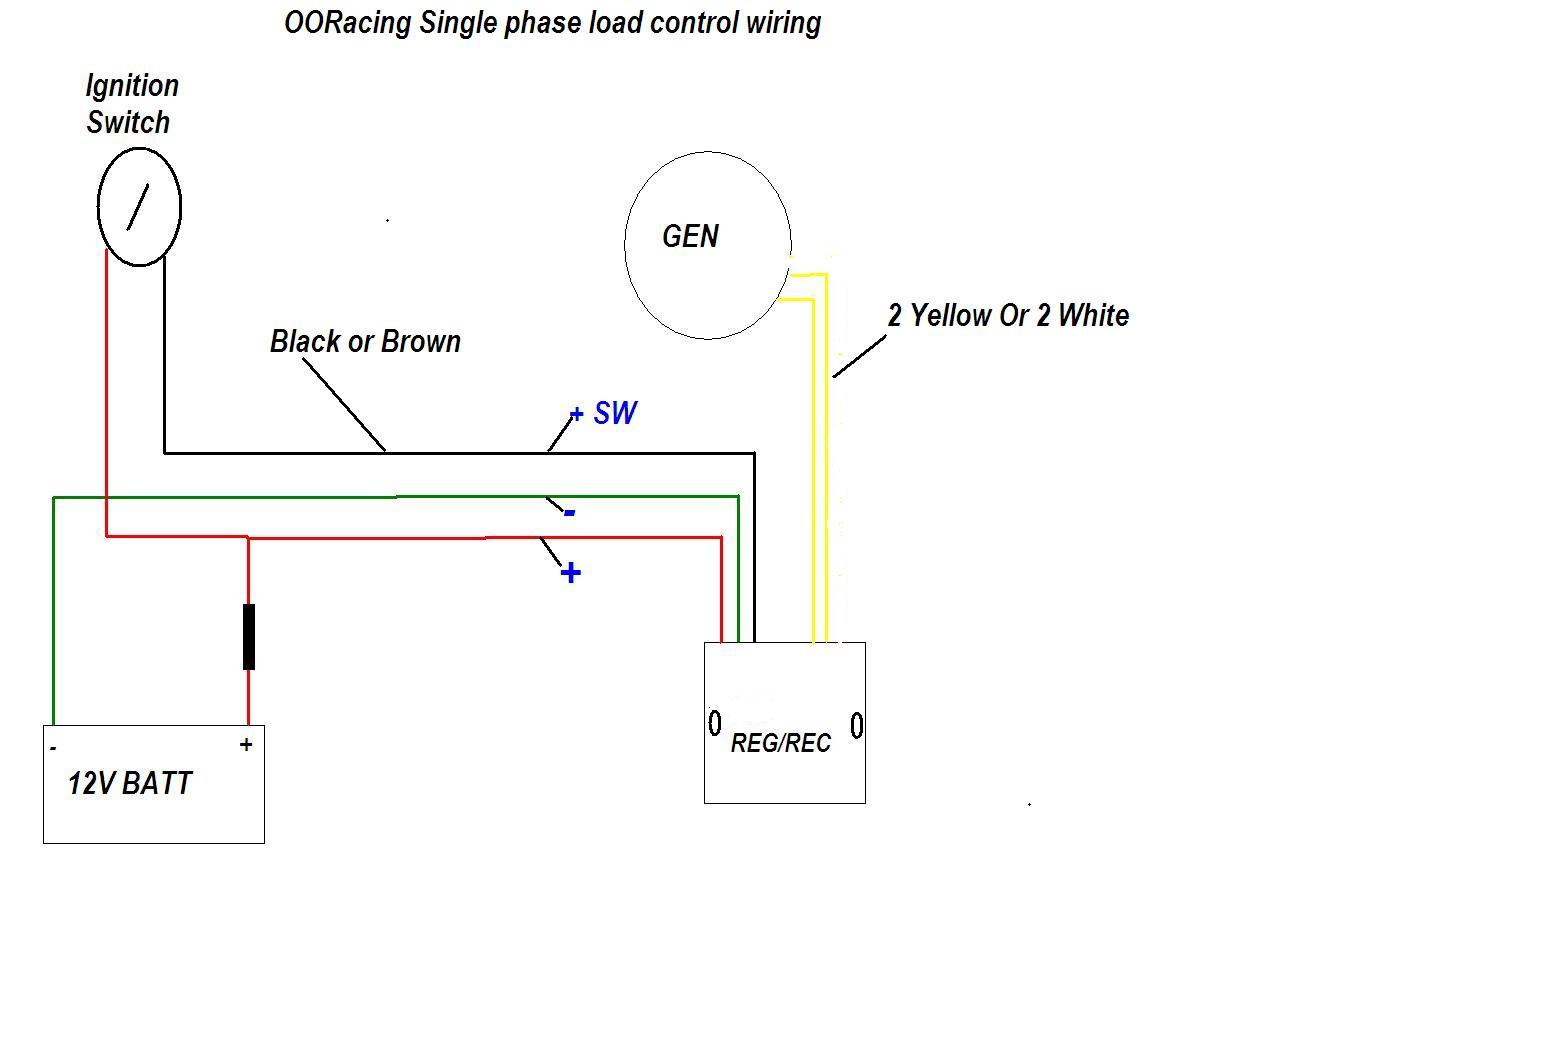 110cc Pit Bike Wiring Diagram Diagrams Quad 125cc For 33 Ssr 110 Tao Atv